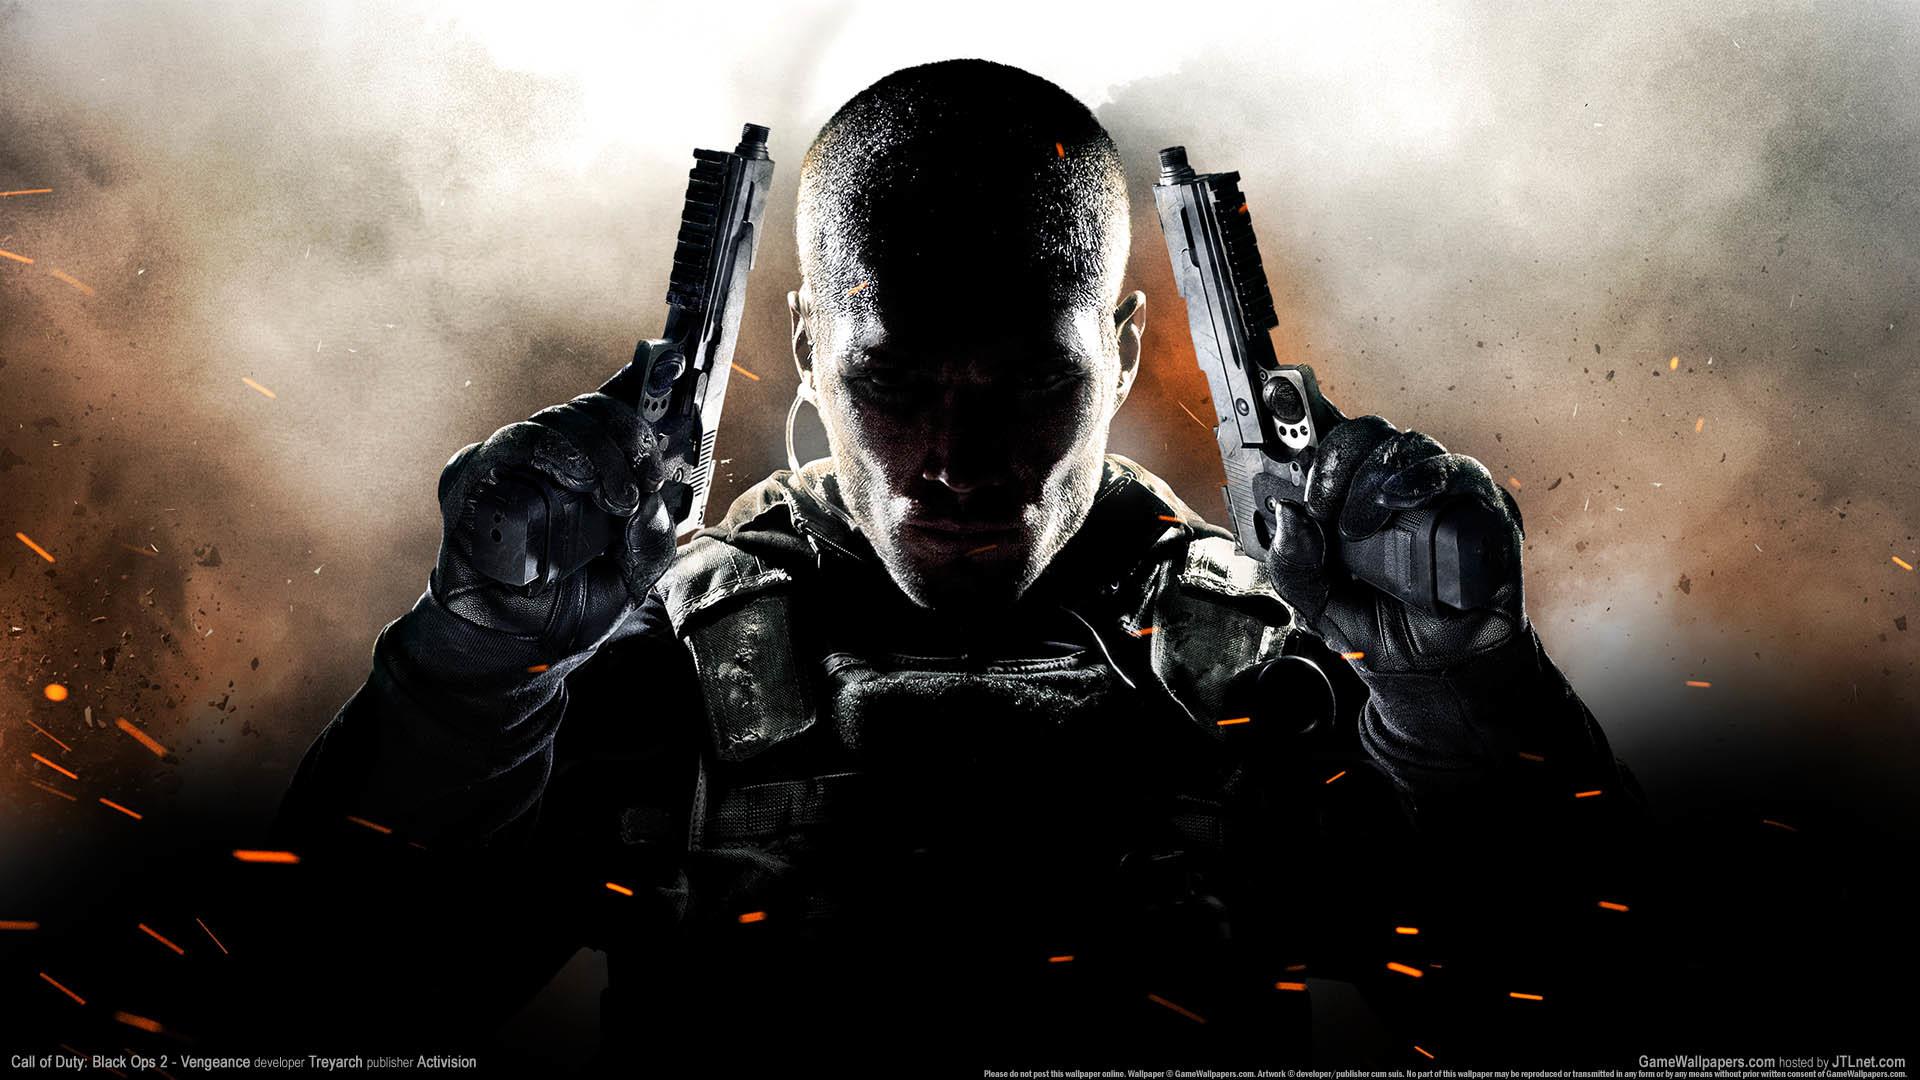 call of duty: black ops 2 – vengeance wallpapers or desktop . …